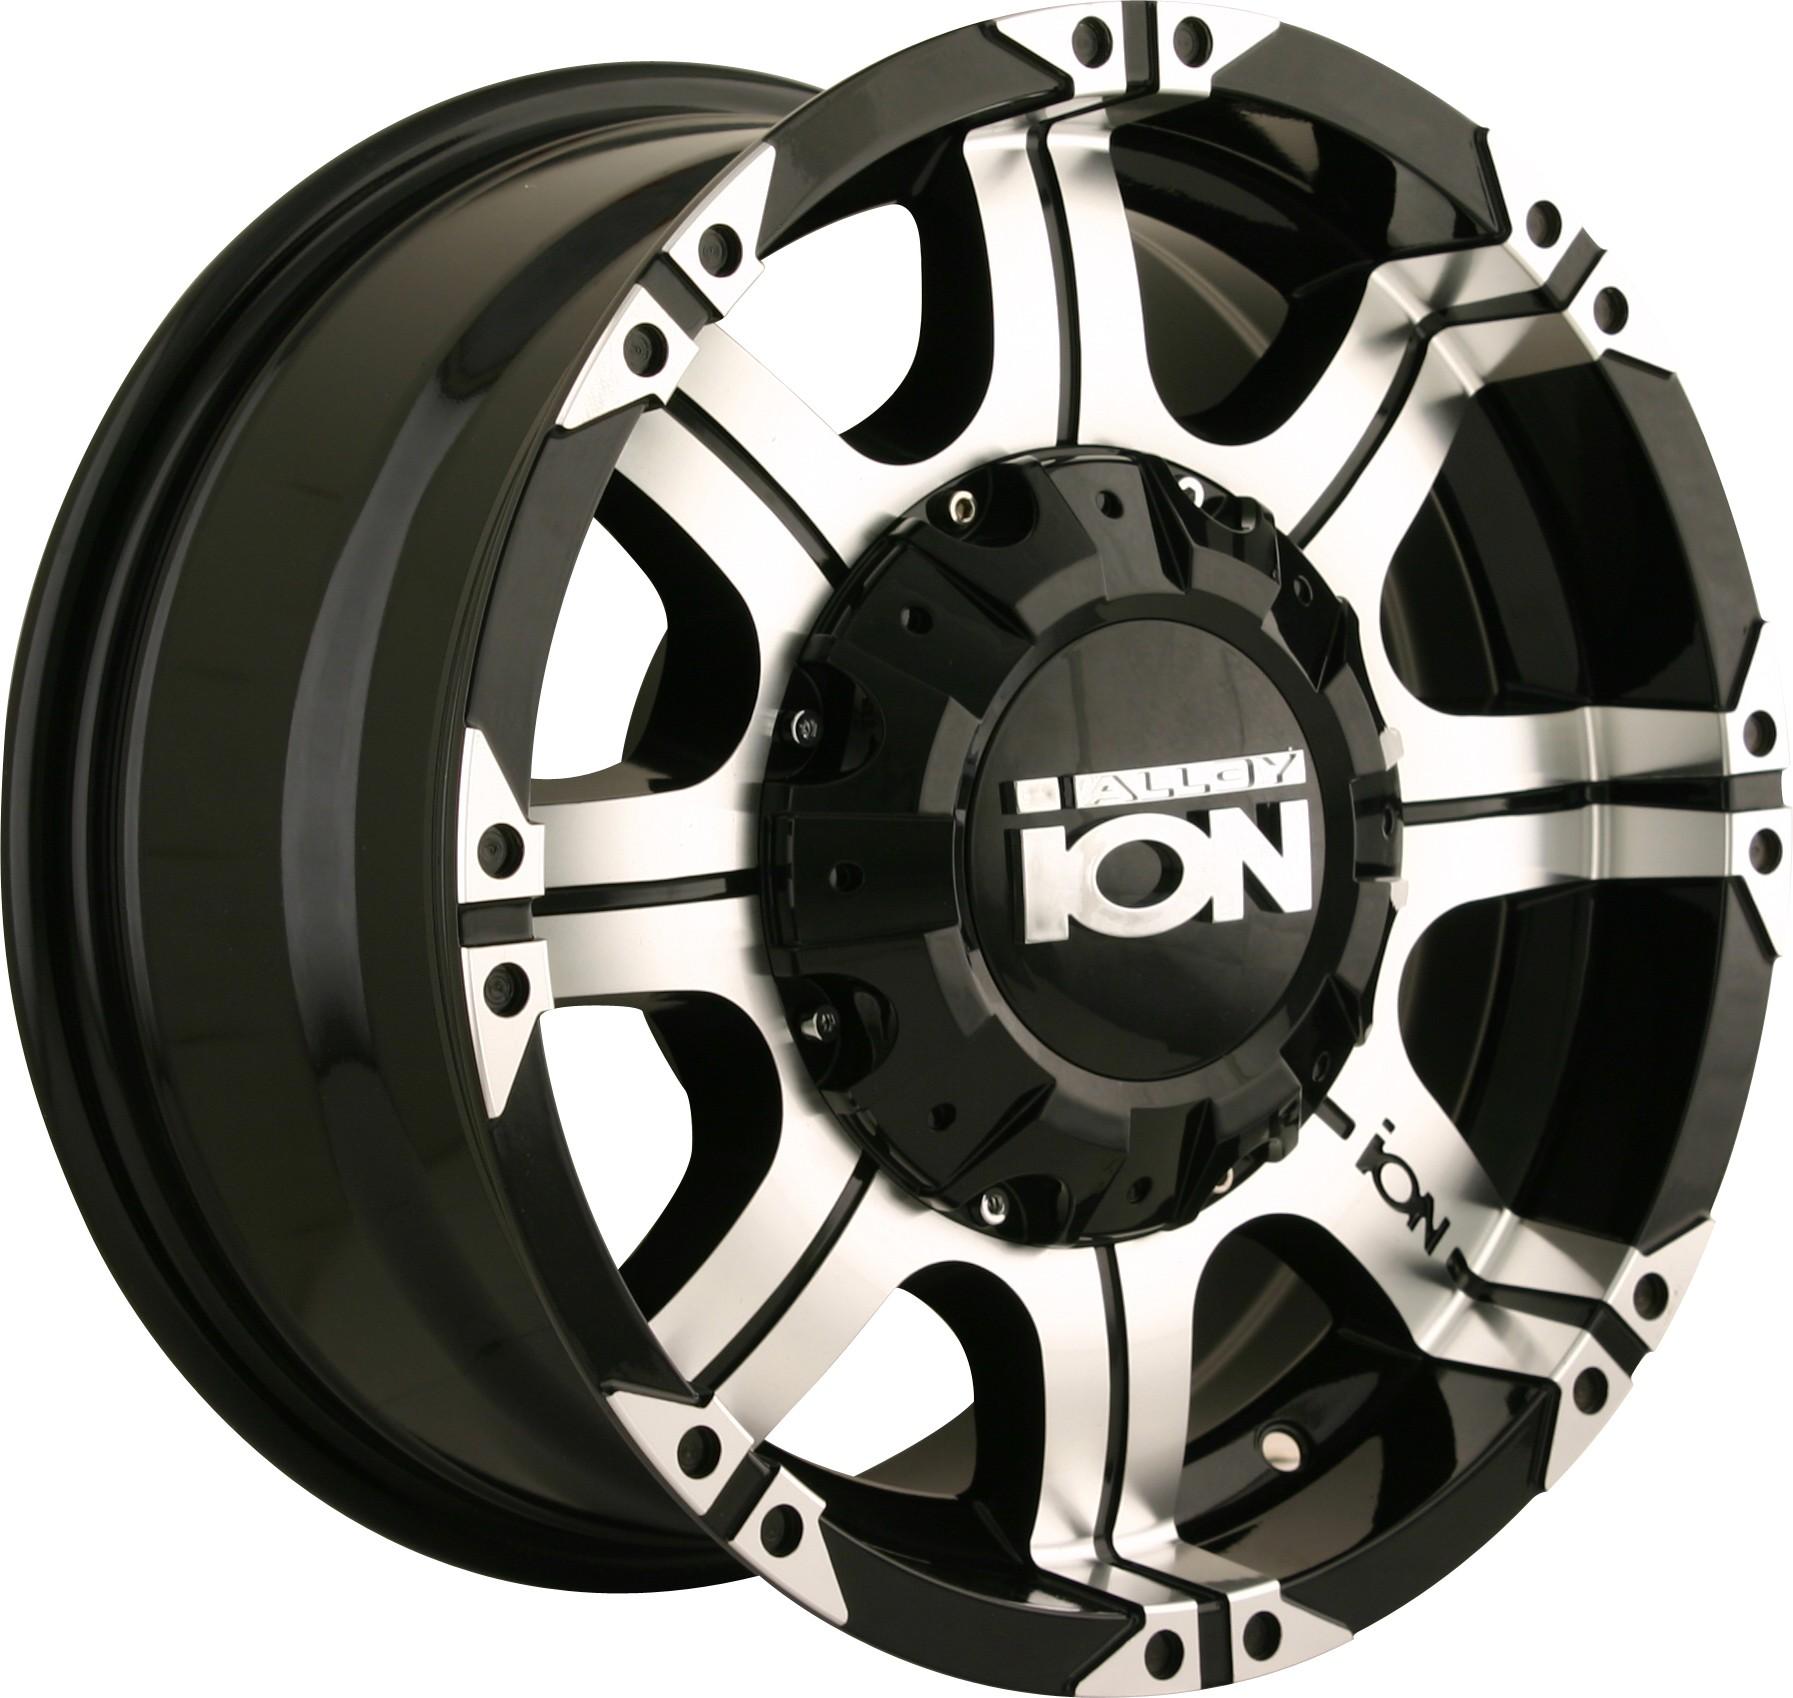 "Ion 187 - 16""x8"" - 8x6.5 - Black"